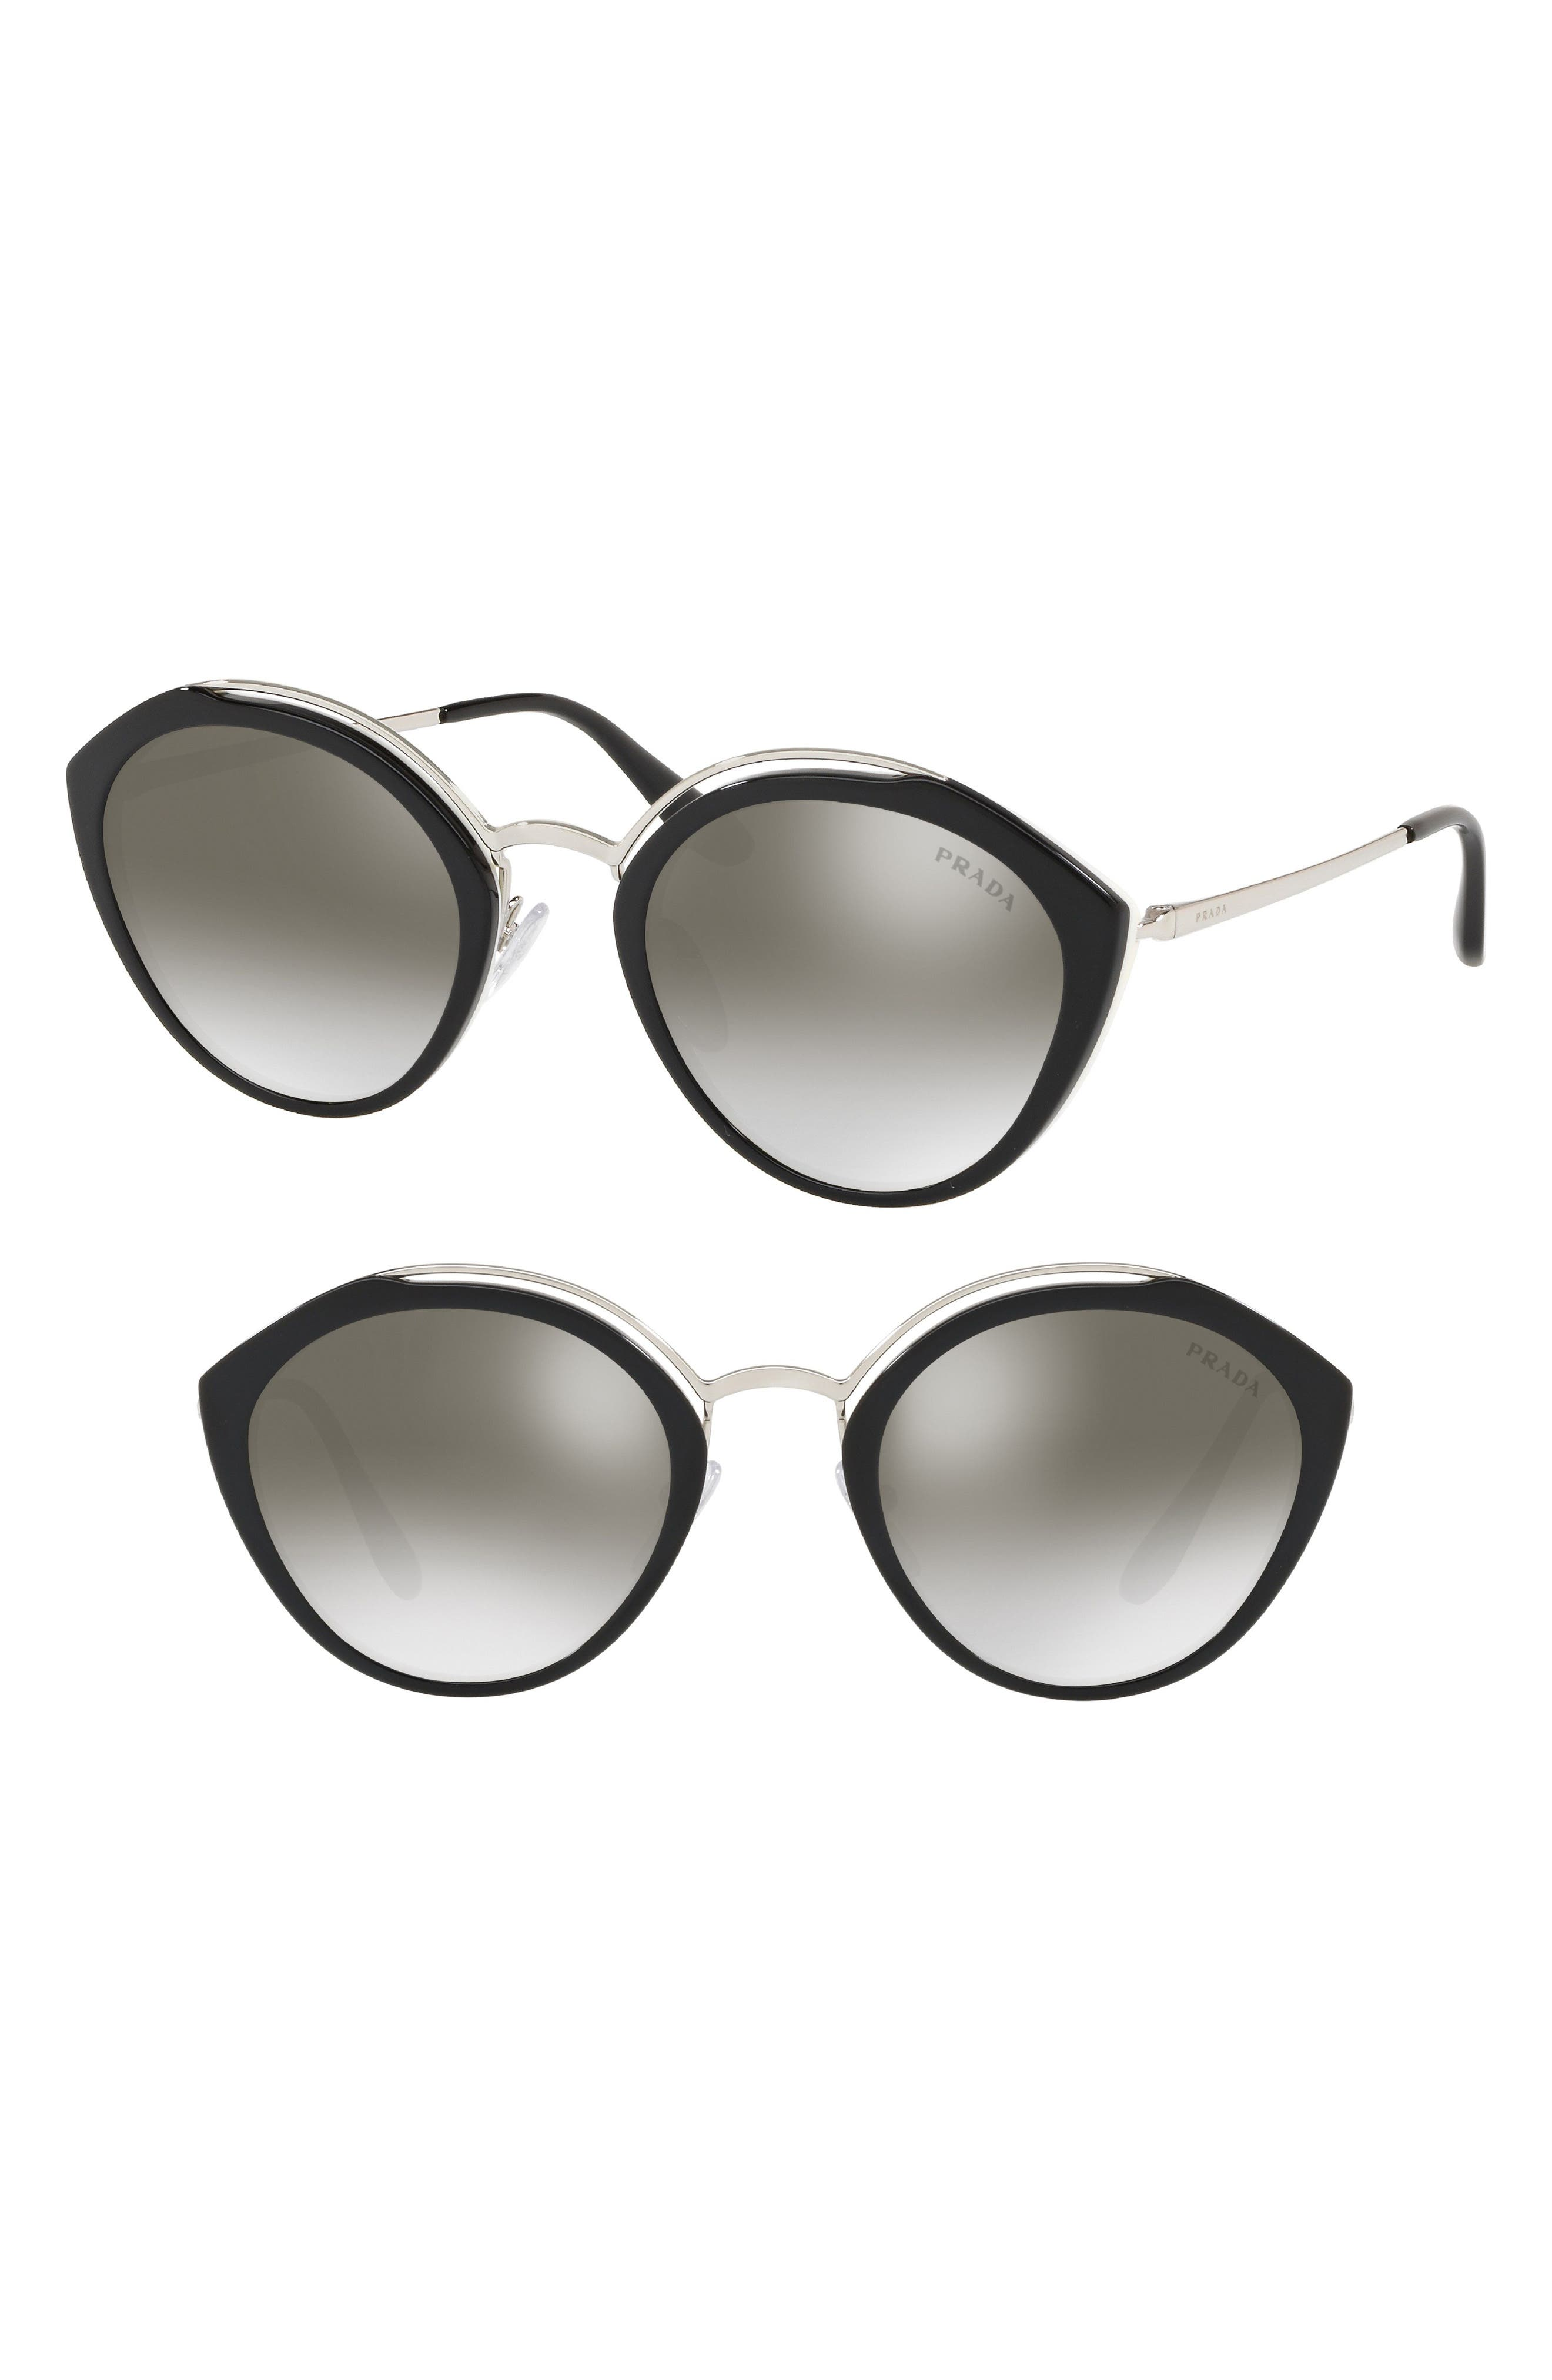 53mm Round Sunglasses,                             Main thumbnail 1, color,                             BLACK/ IVORY GRADIENT MIRROR